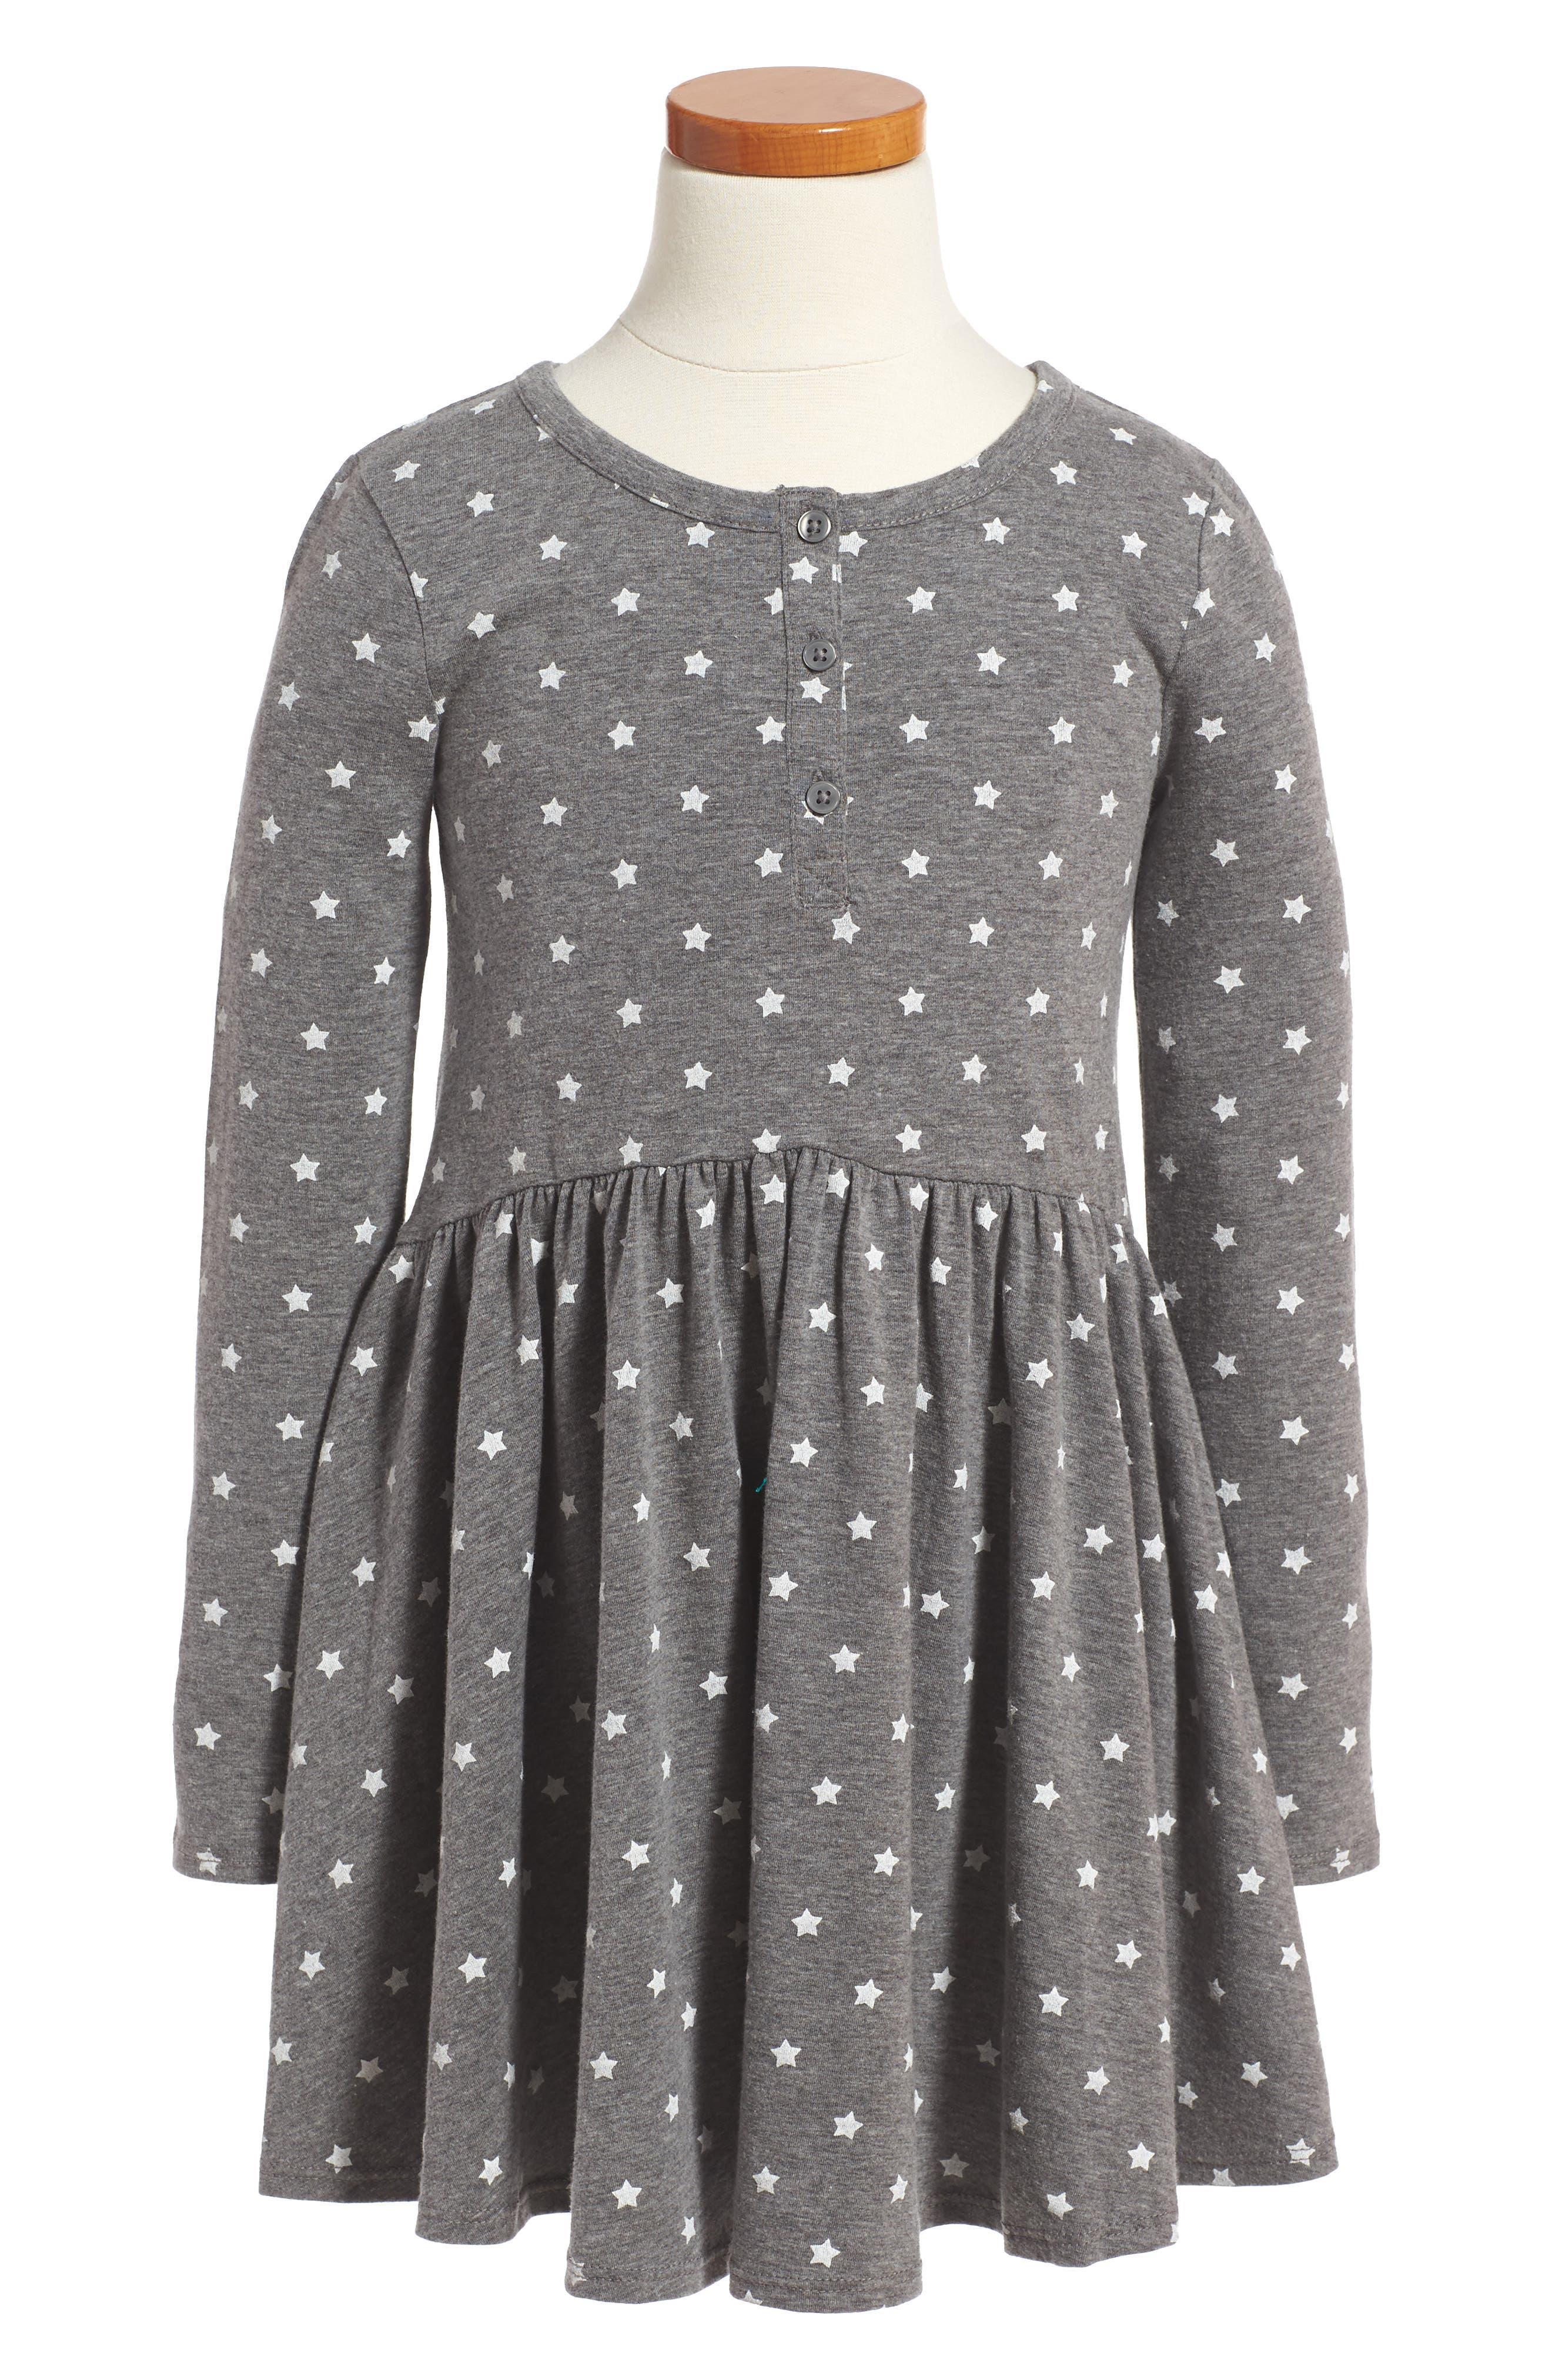 Main Image - Tucker + Tate Print Knit Dress (Toddler Girls, Little Girls & Big Girls)